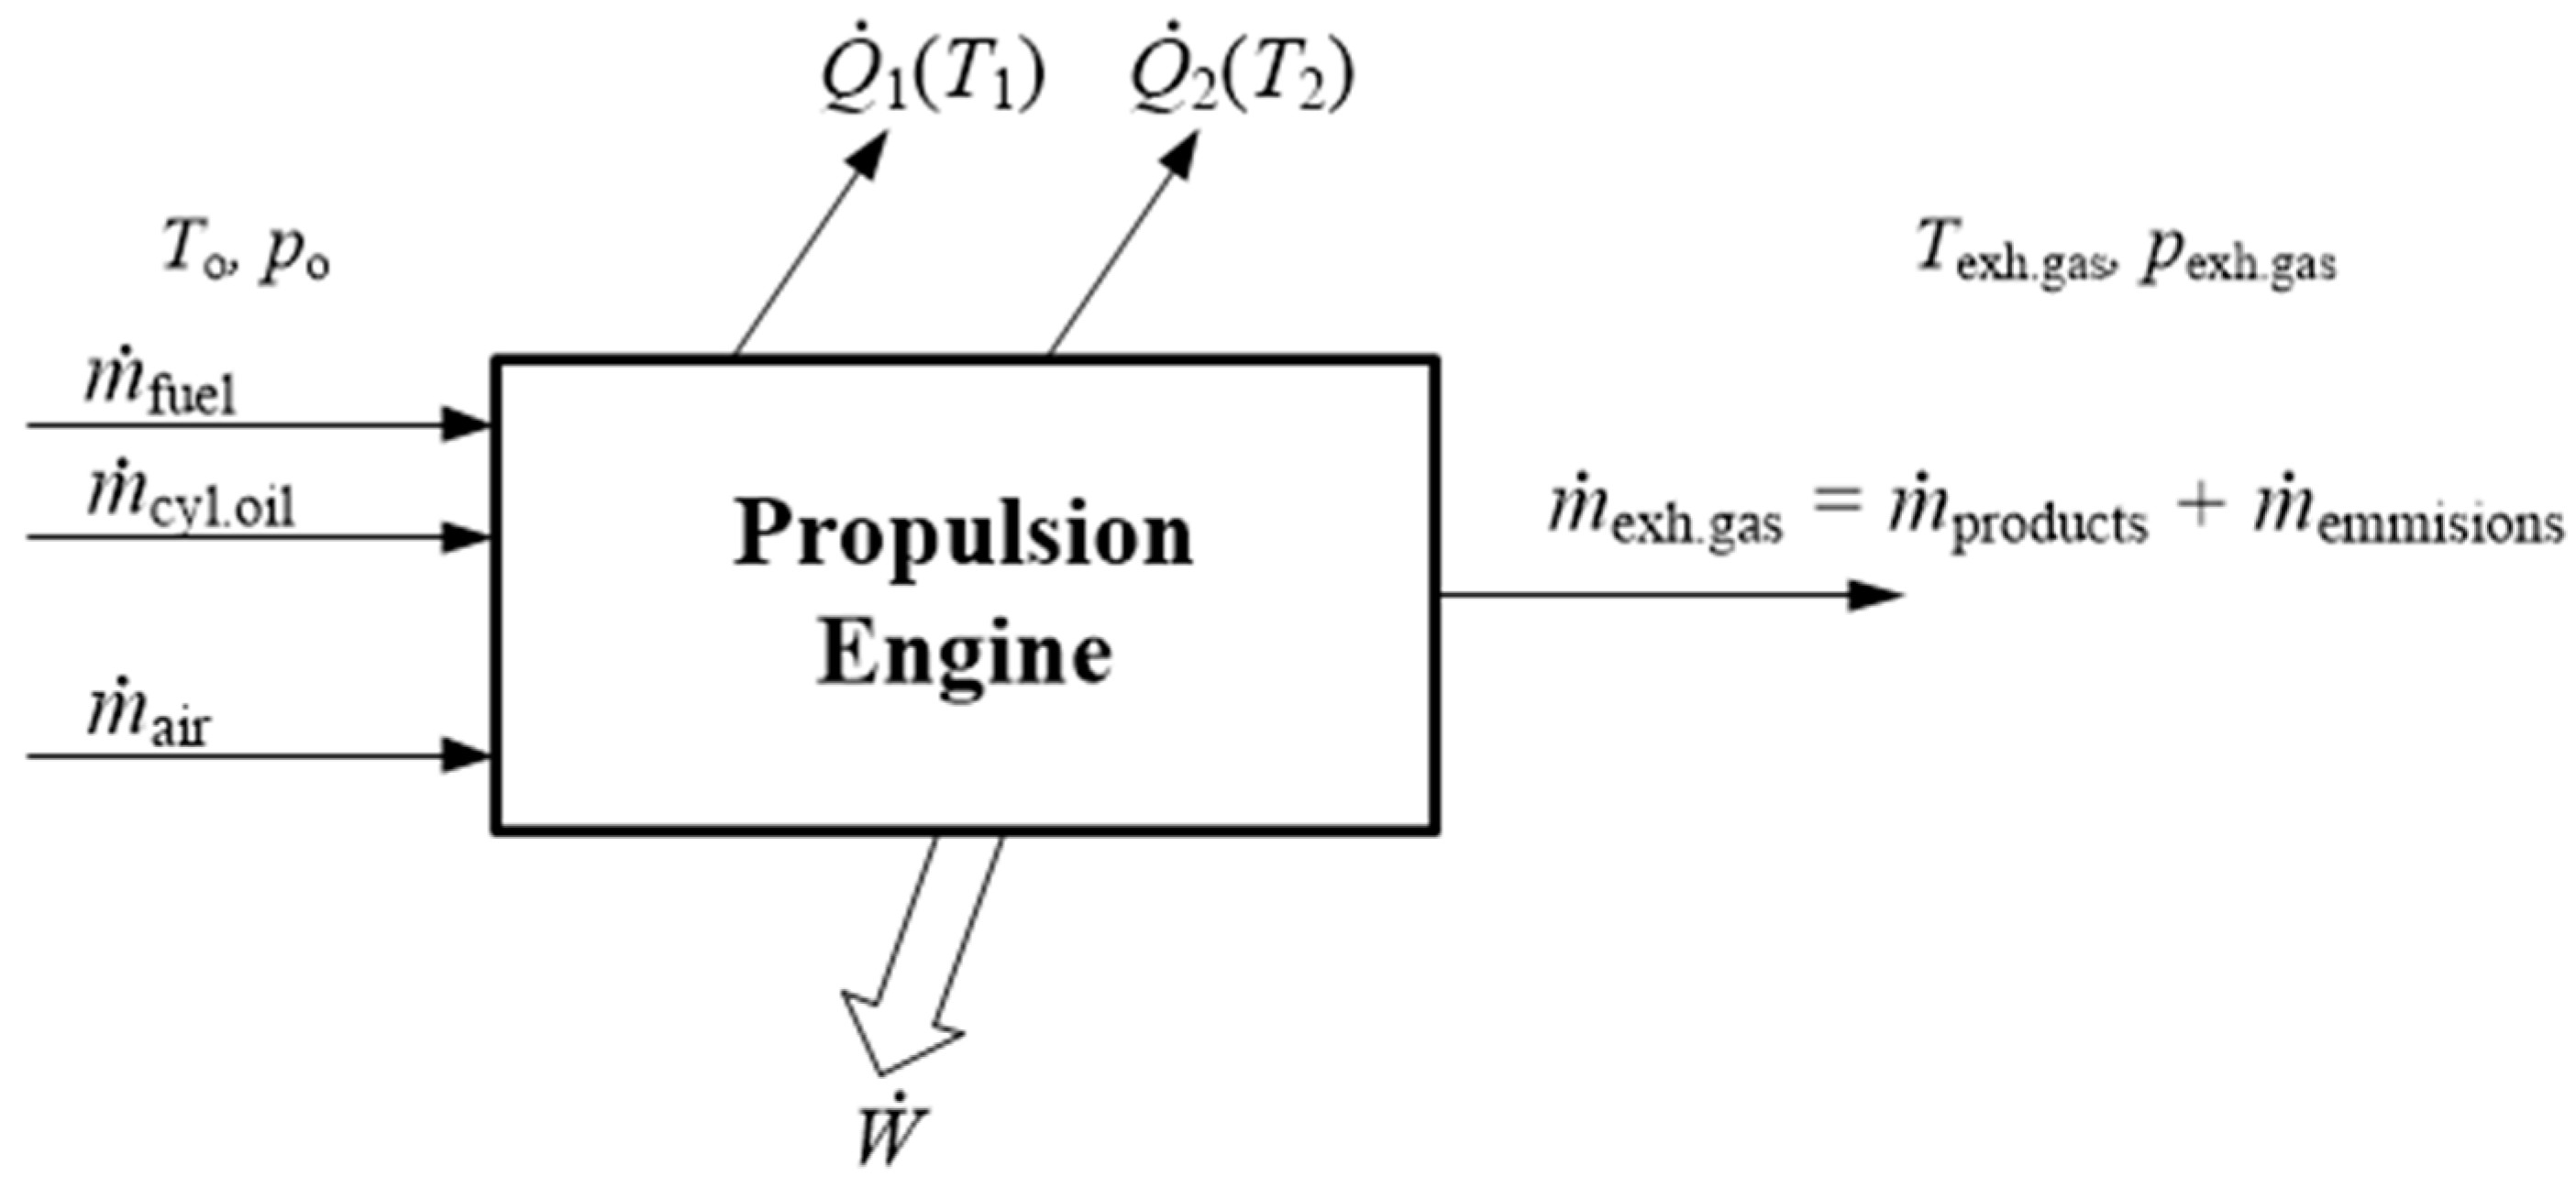 4 Stroke Engine Timing Diagram Energies Free Full Text Of 4 Stroke Engine Timing Diagram